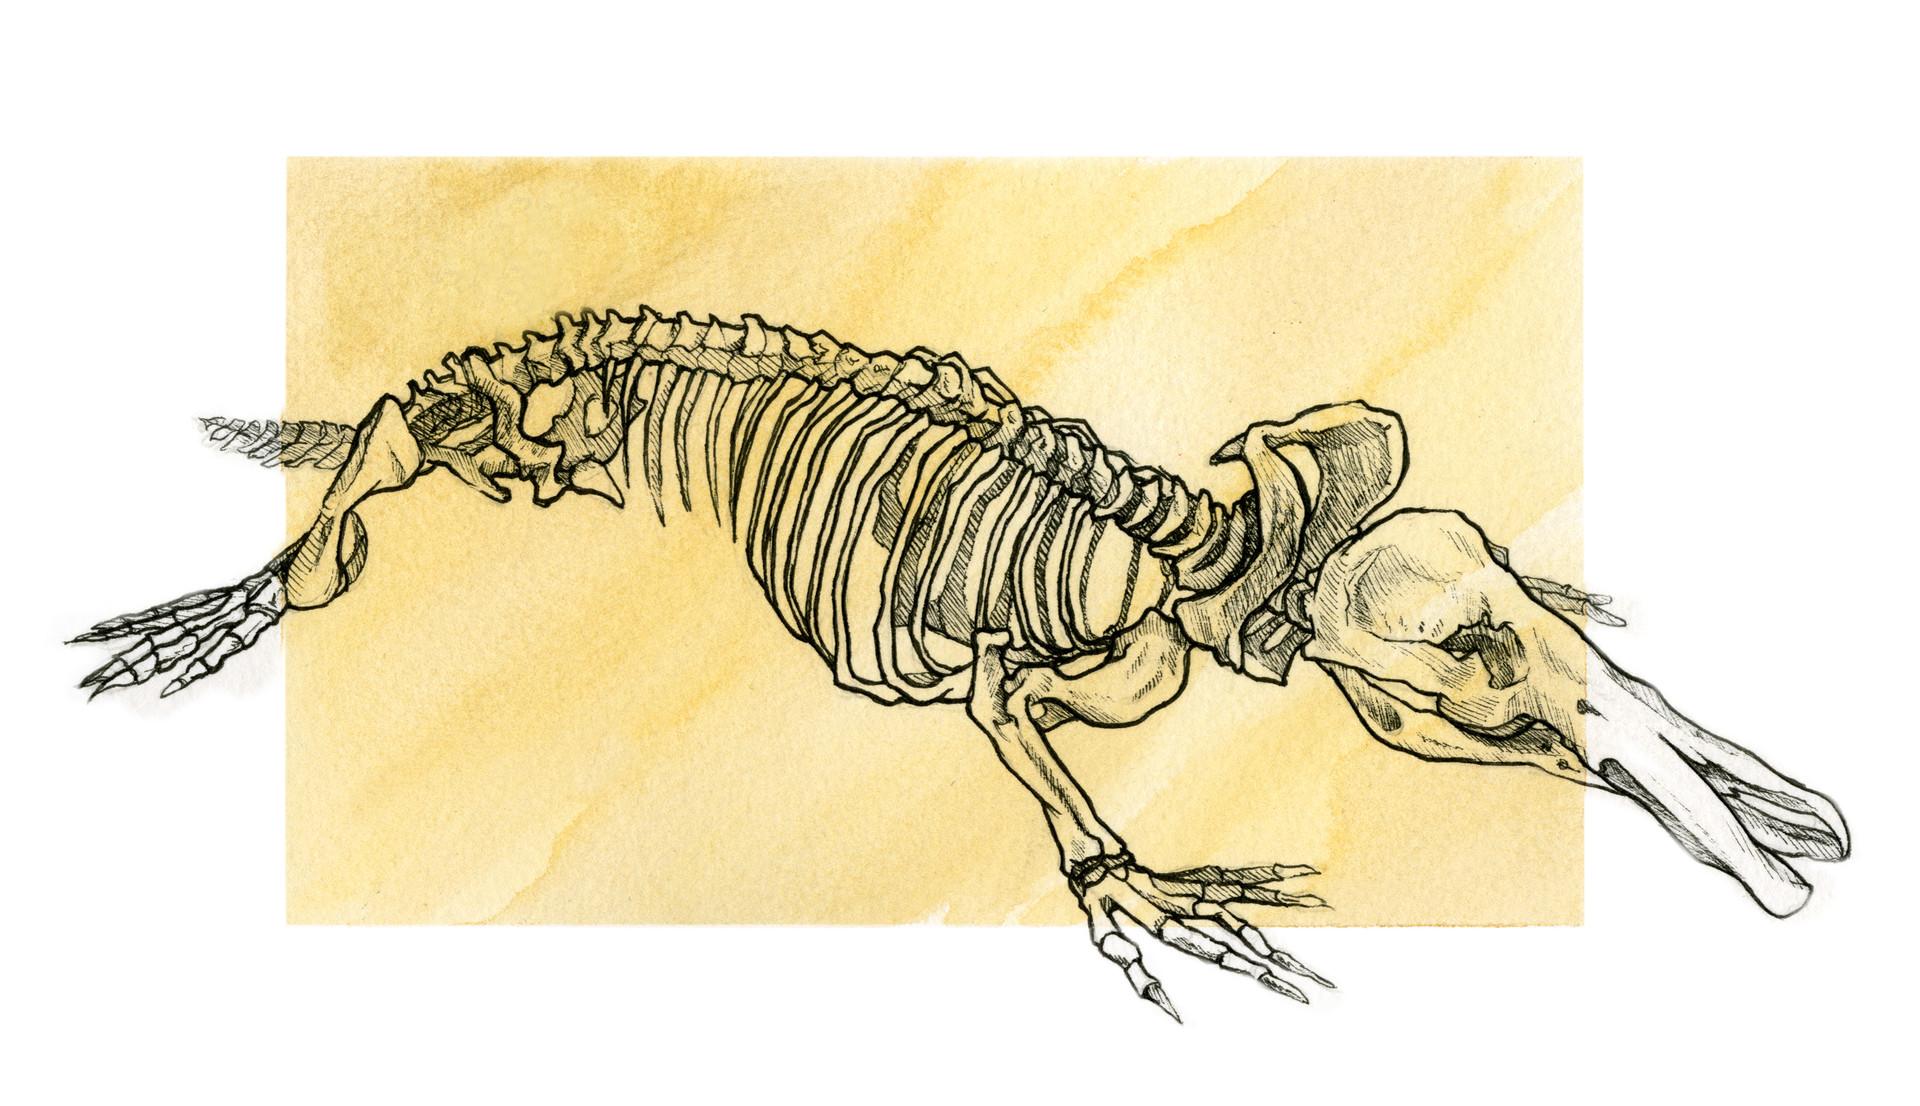 ArtStation - The Platypus - Naturalist Illustration , Luca Lonardi